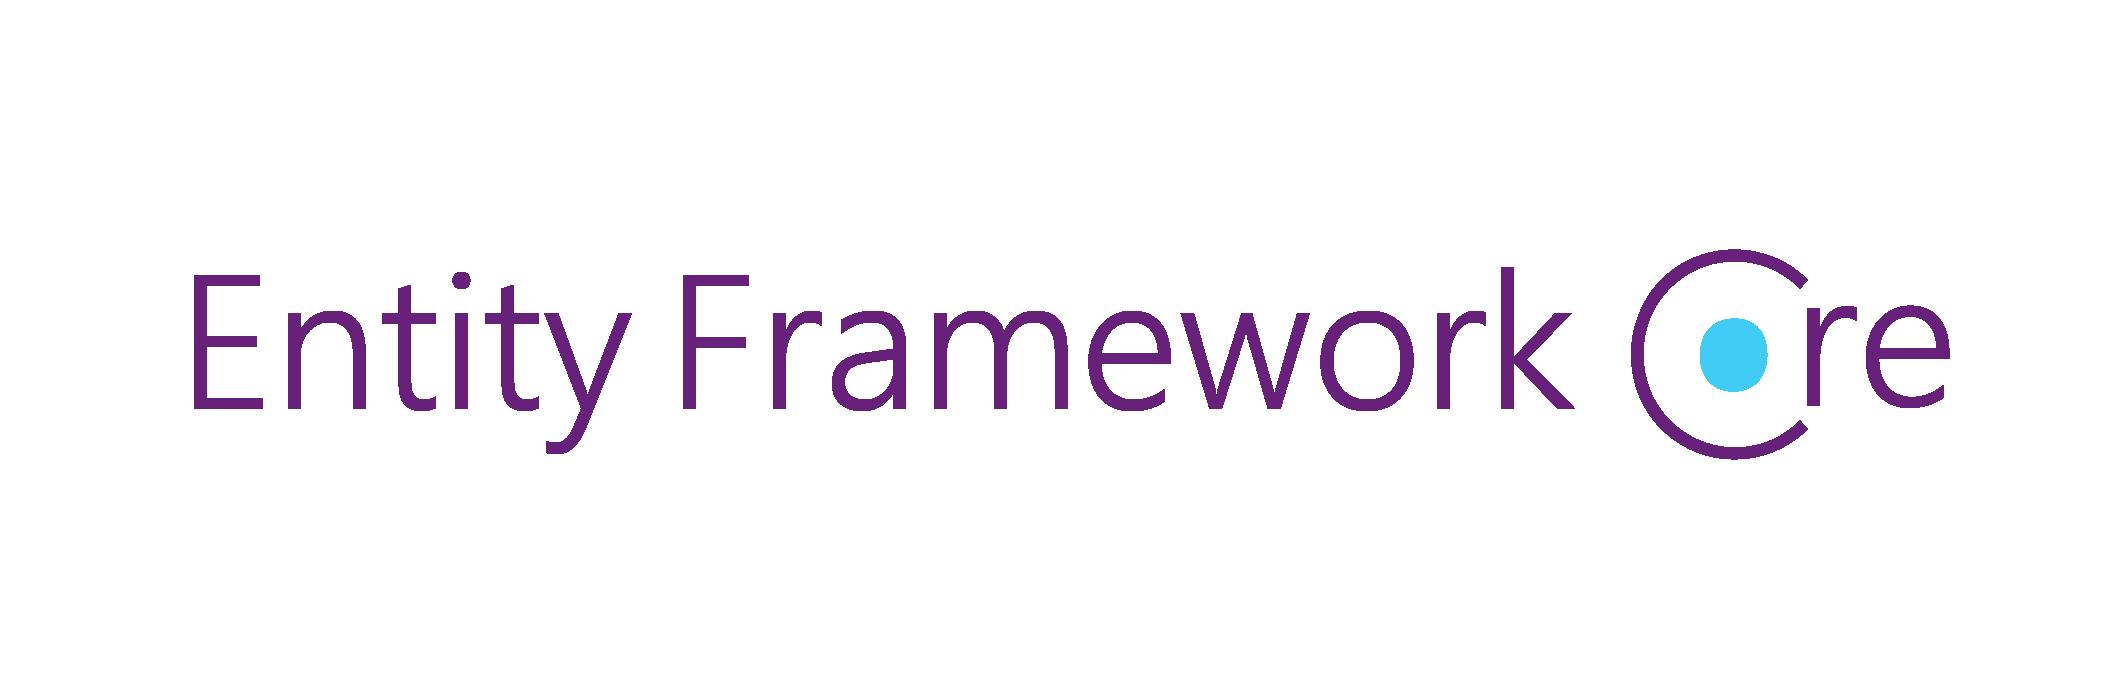 https://raw.githubusercontent.com/campusMVP/dotnetCoreLogoPack/master/Entity%20Framework%20Core/Bitmap%20RGB/Bitmap-BIG_Entity-Framework-Core-Logo_2Colors_RGB.png